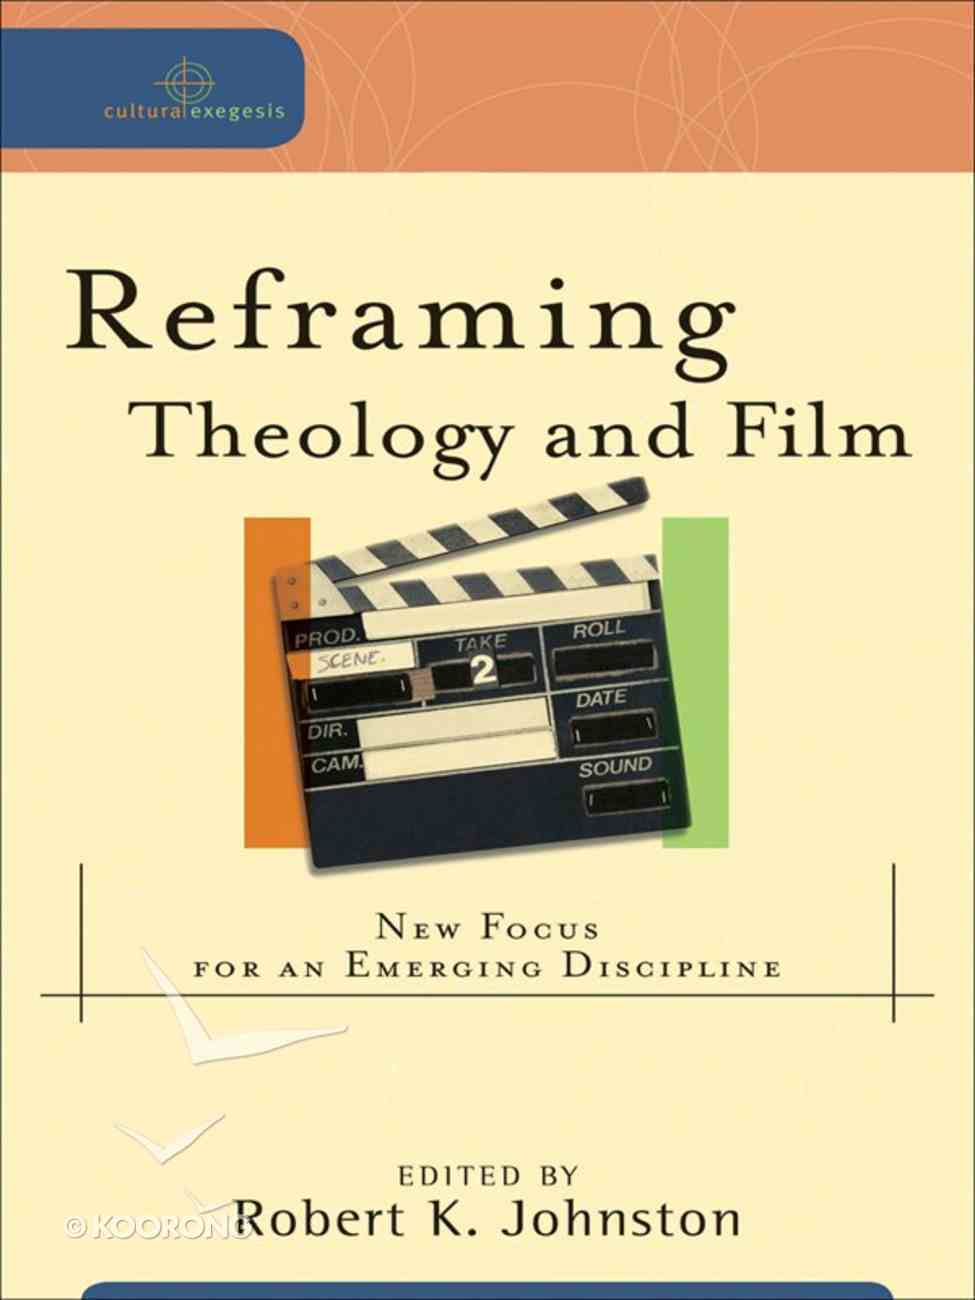 Reframing Theology Anf Film (Cultural Exegesis Series) eBook